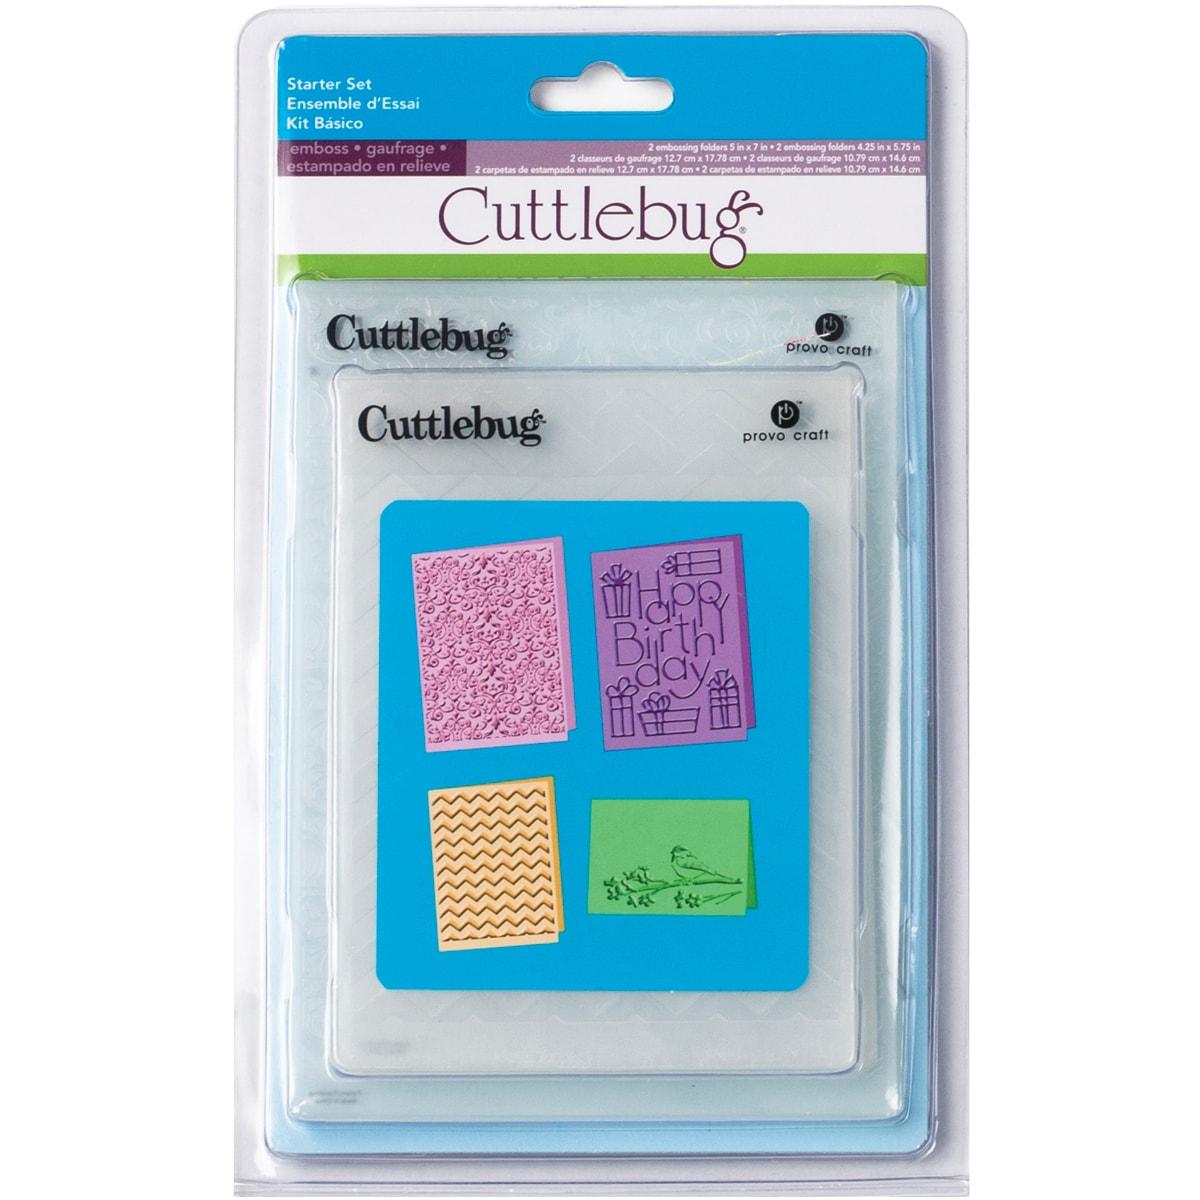 Cuttlebug Cricut Companion Embossing Folders Starter Bundle (Pack of 4)